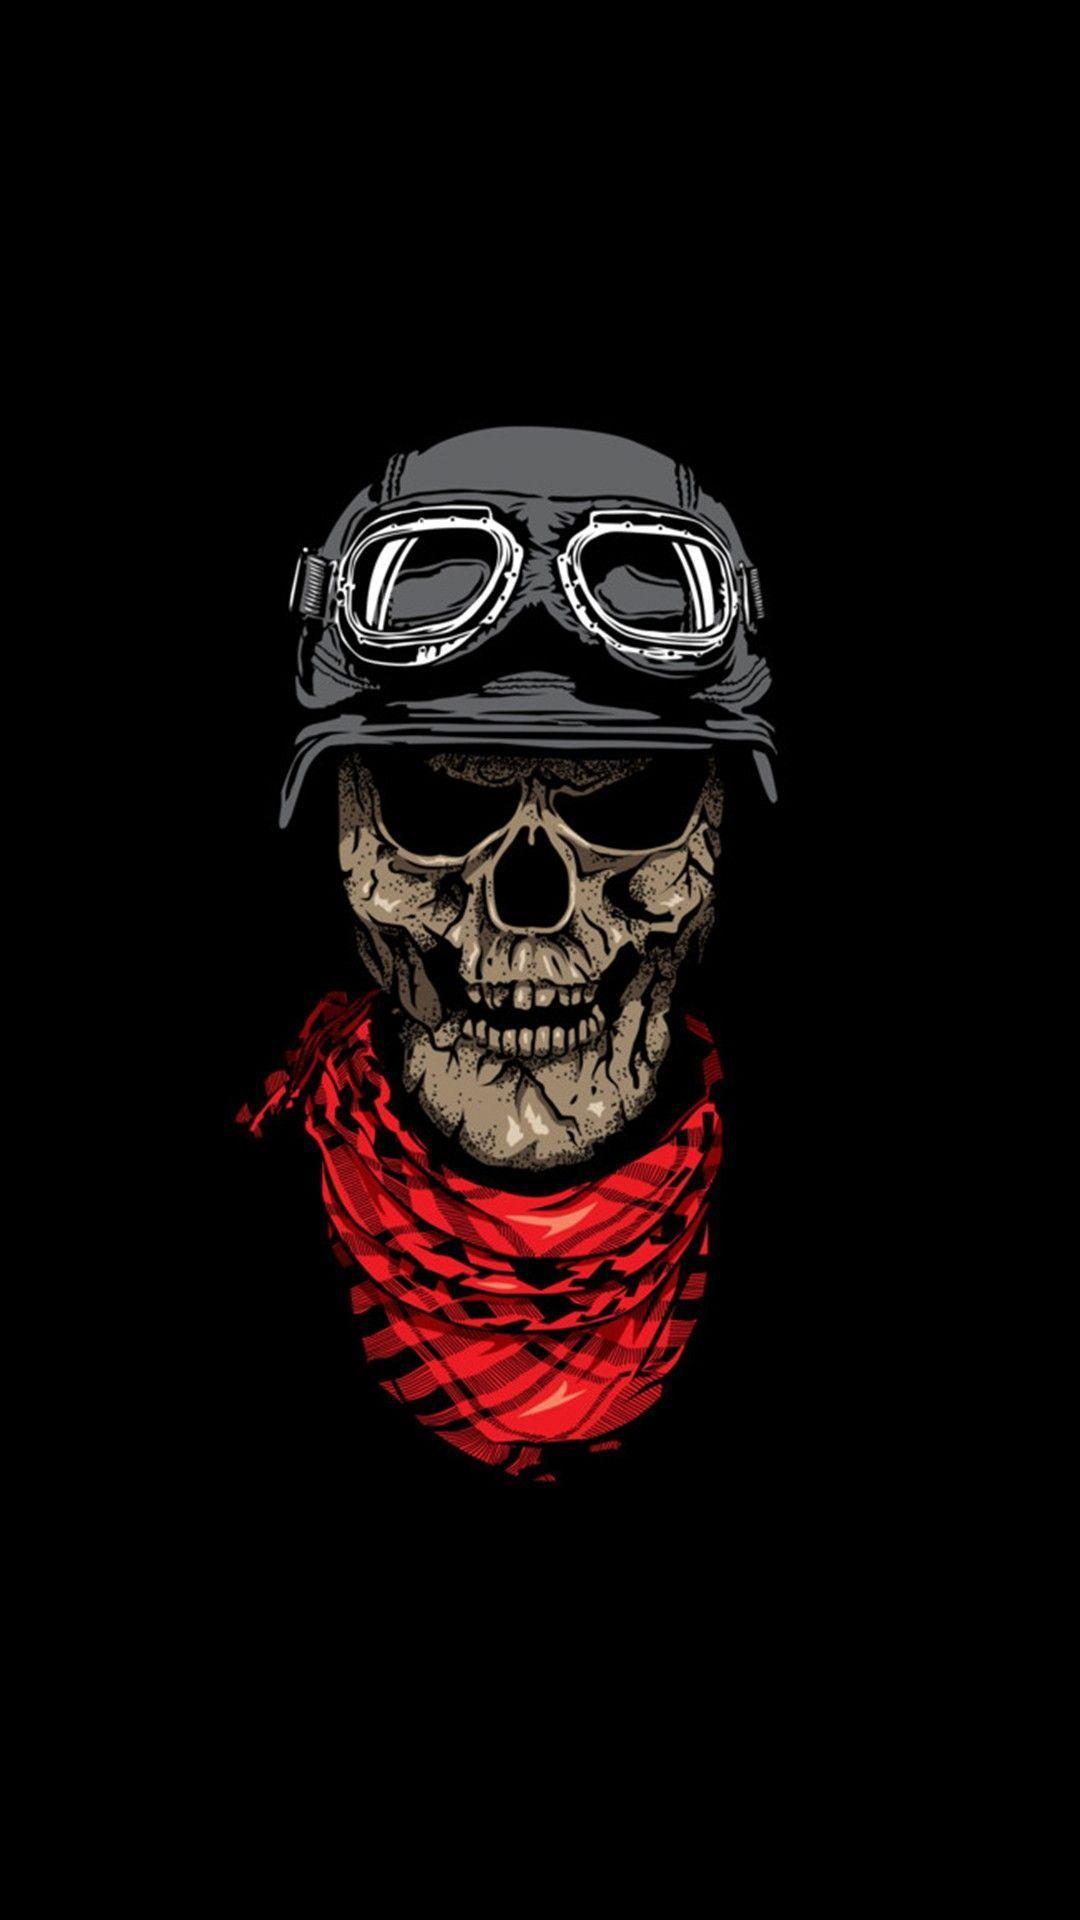 Cool Skull wallpaper iPhone 5